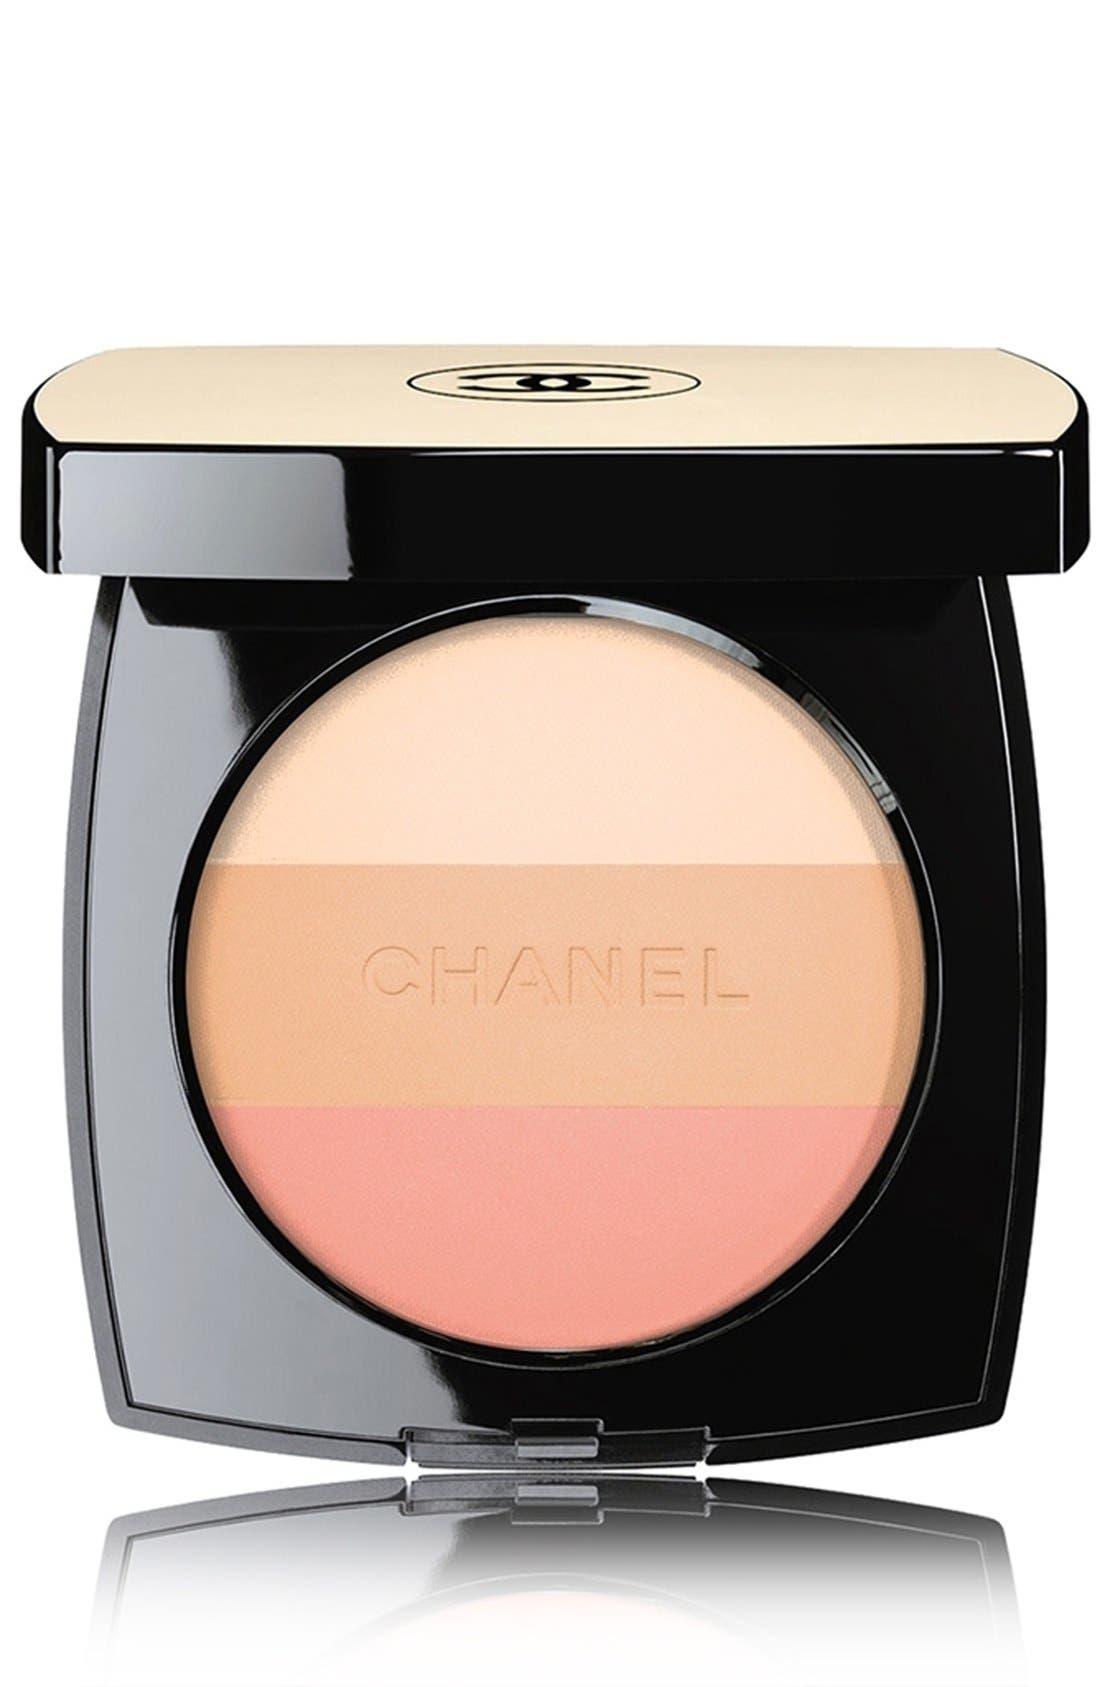 LES BEIGES<br />Healthy Glow Multicolor Broad Spectrum SPF 15 Sunscreen,                             Main thumbnail 1, color,                             250